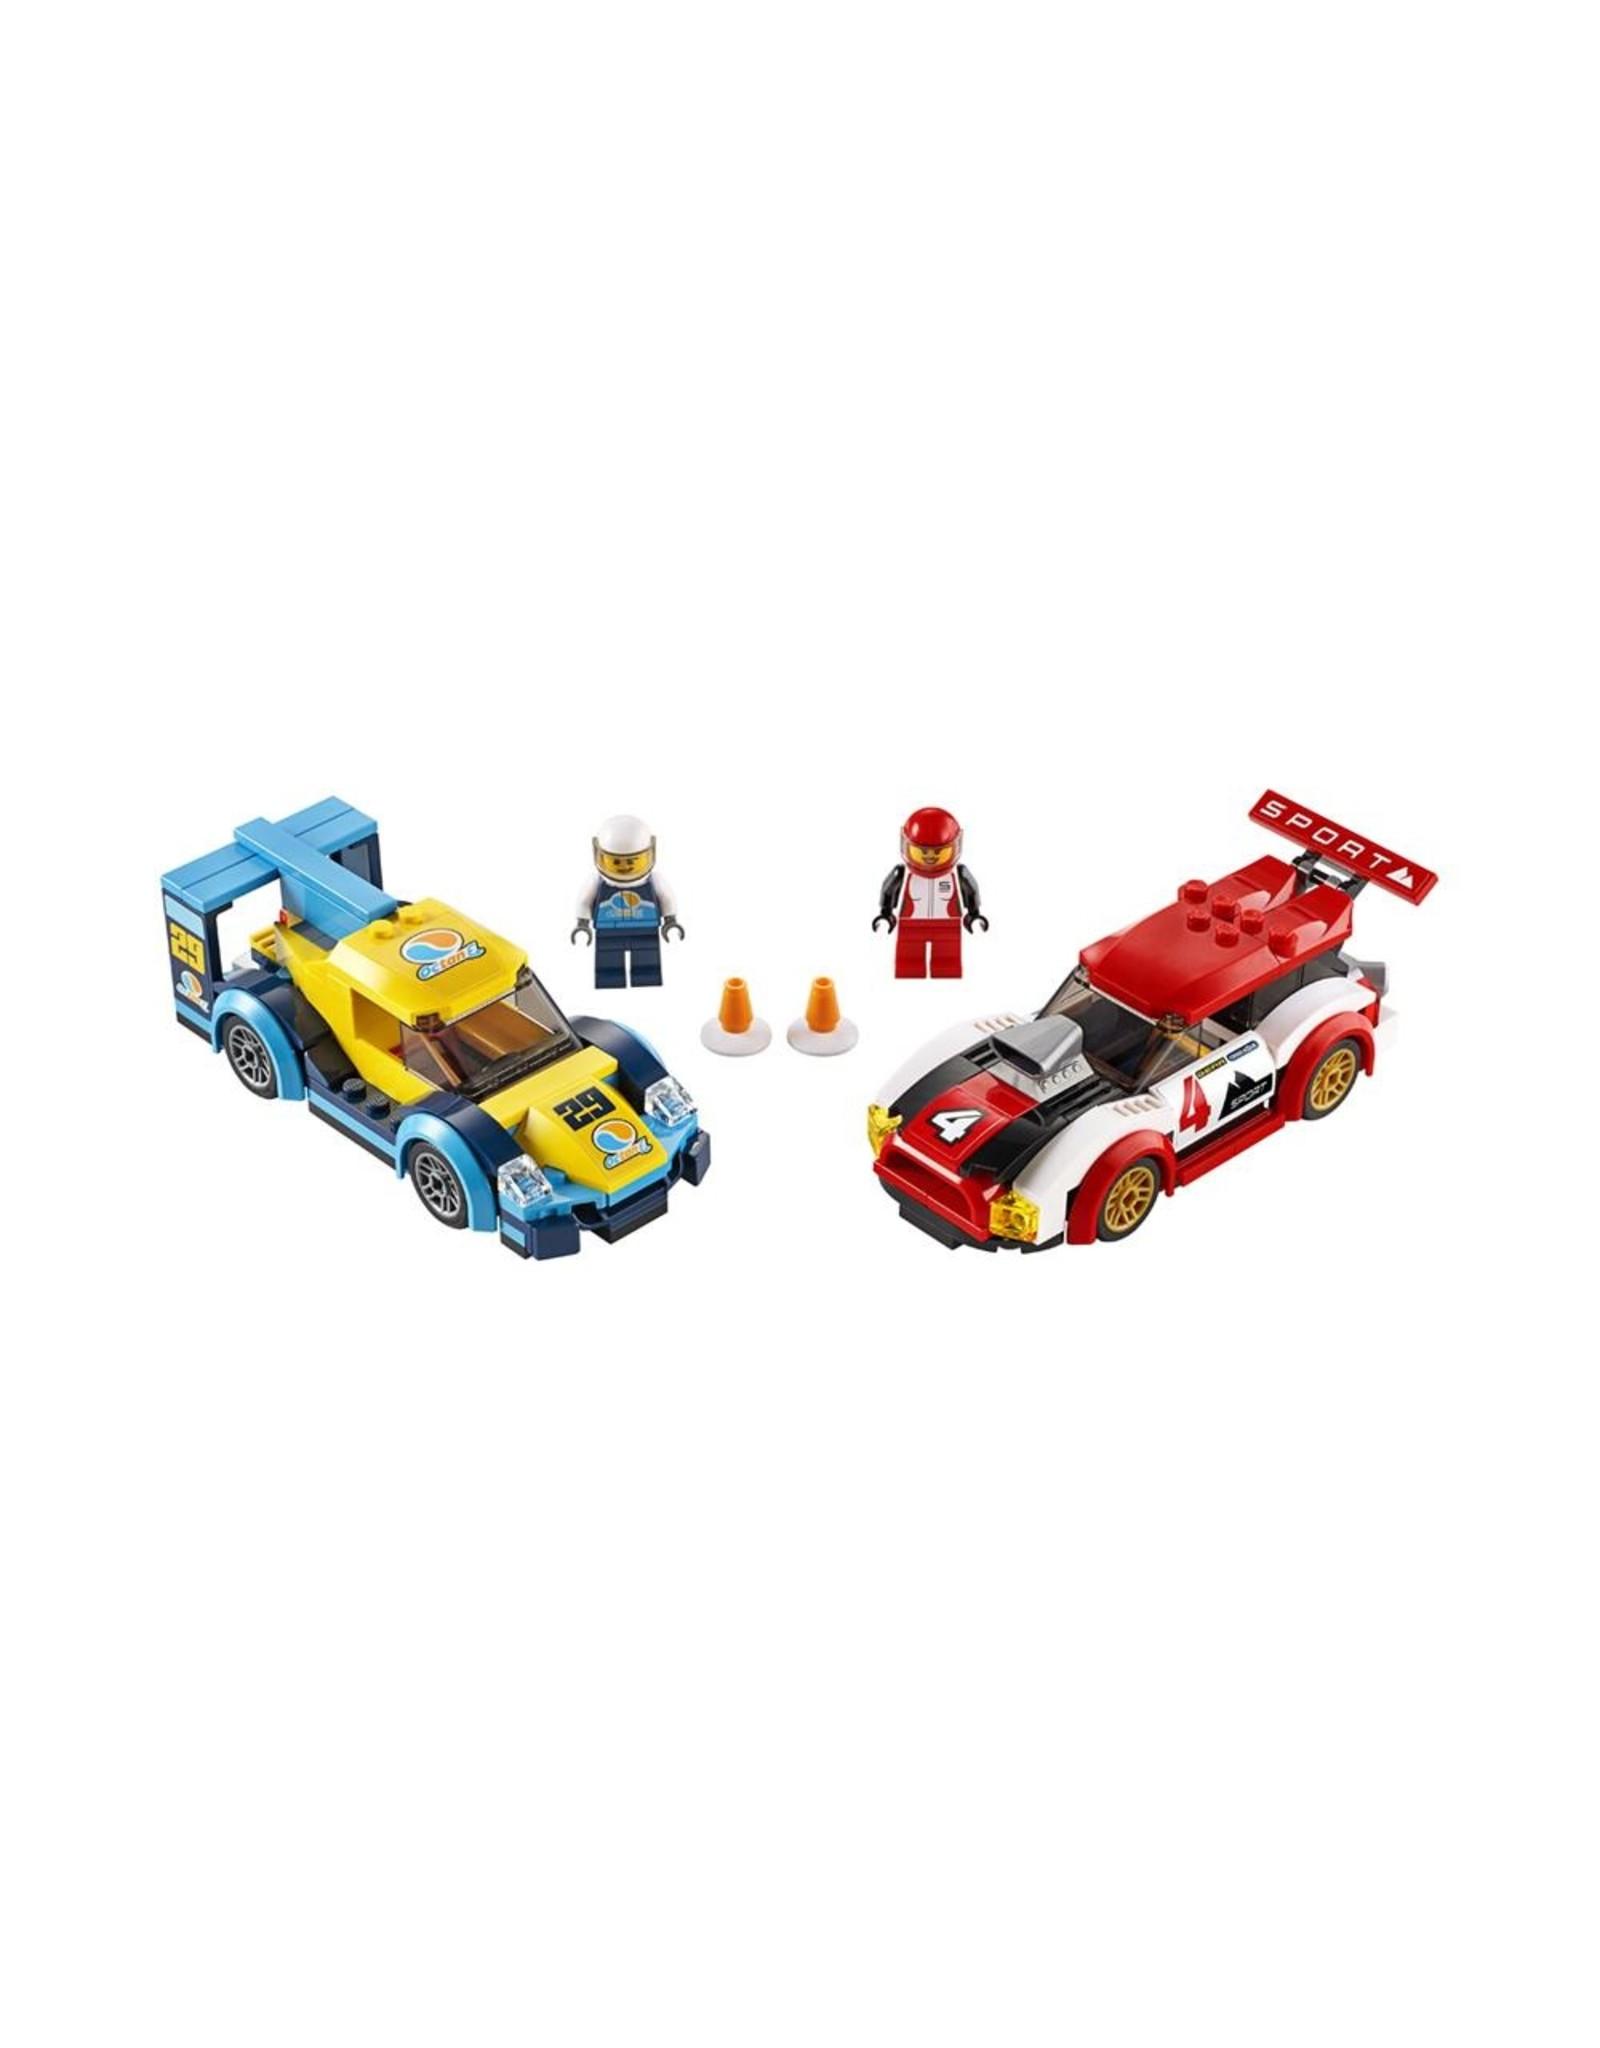 LEGO City 60256 Racing Cars